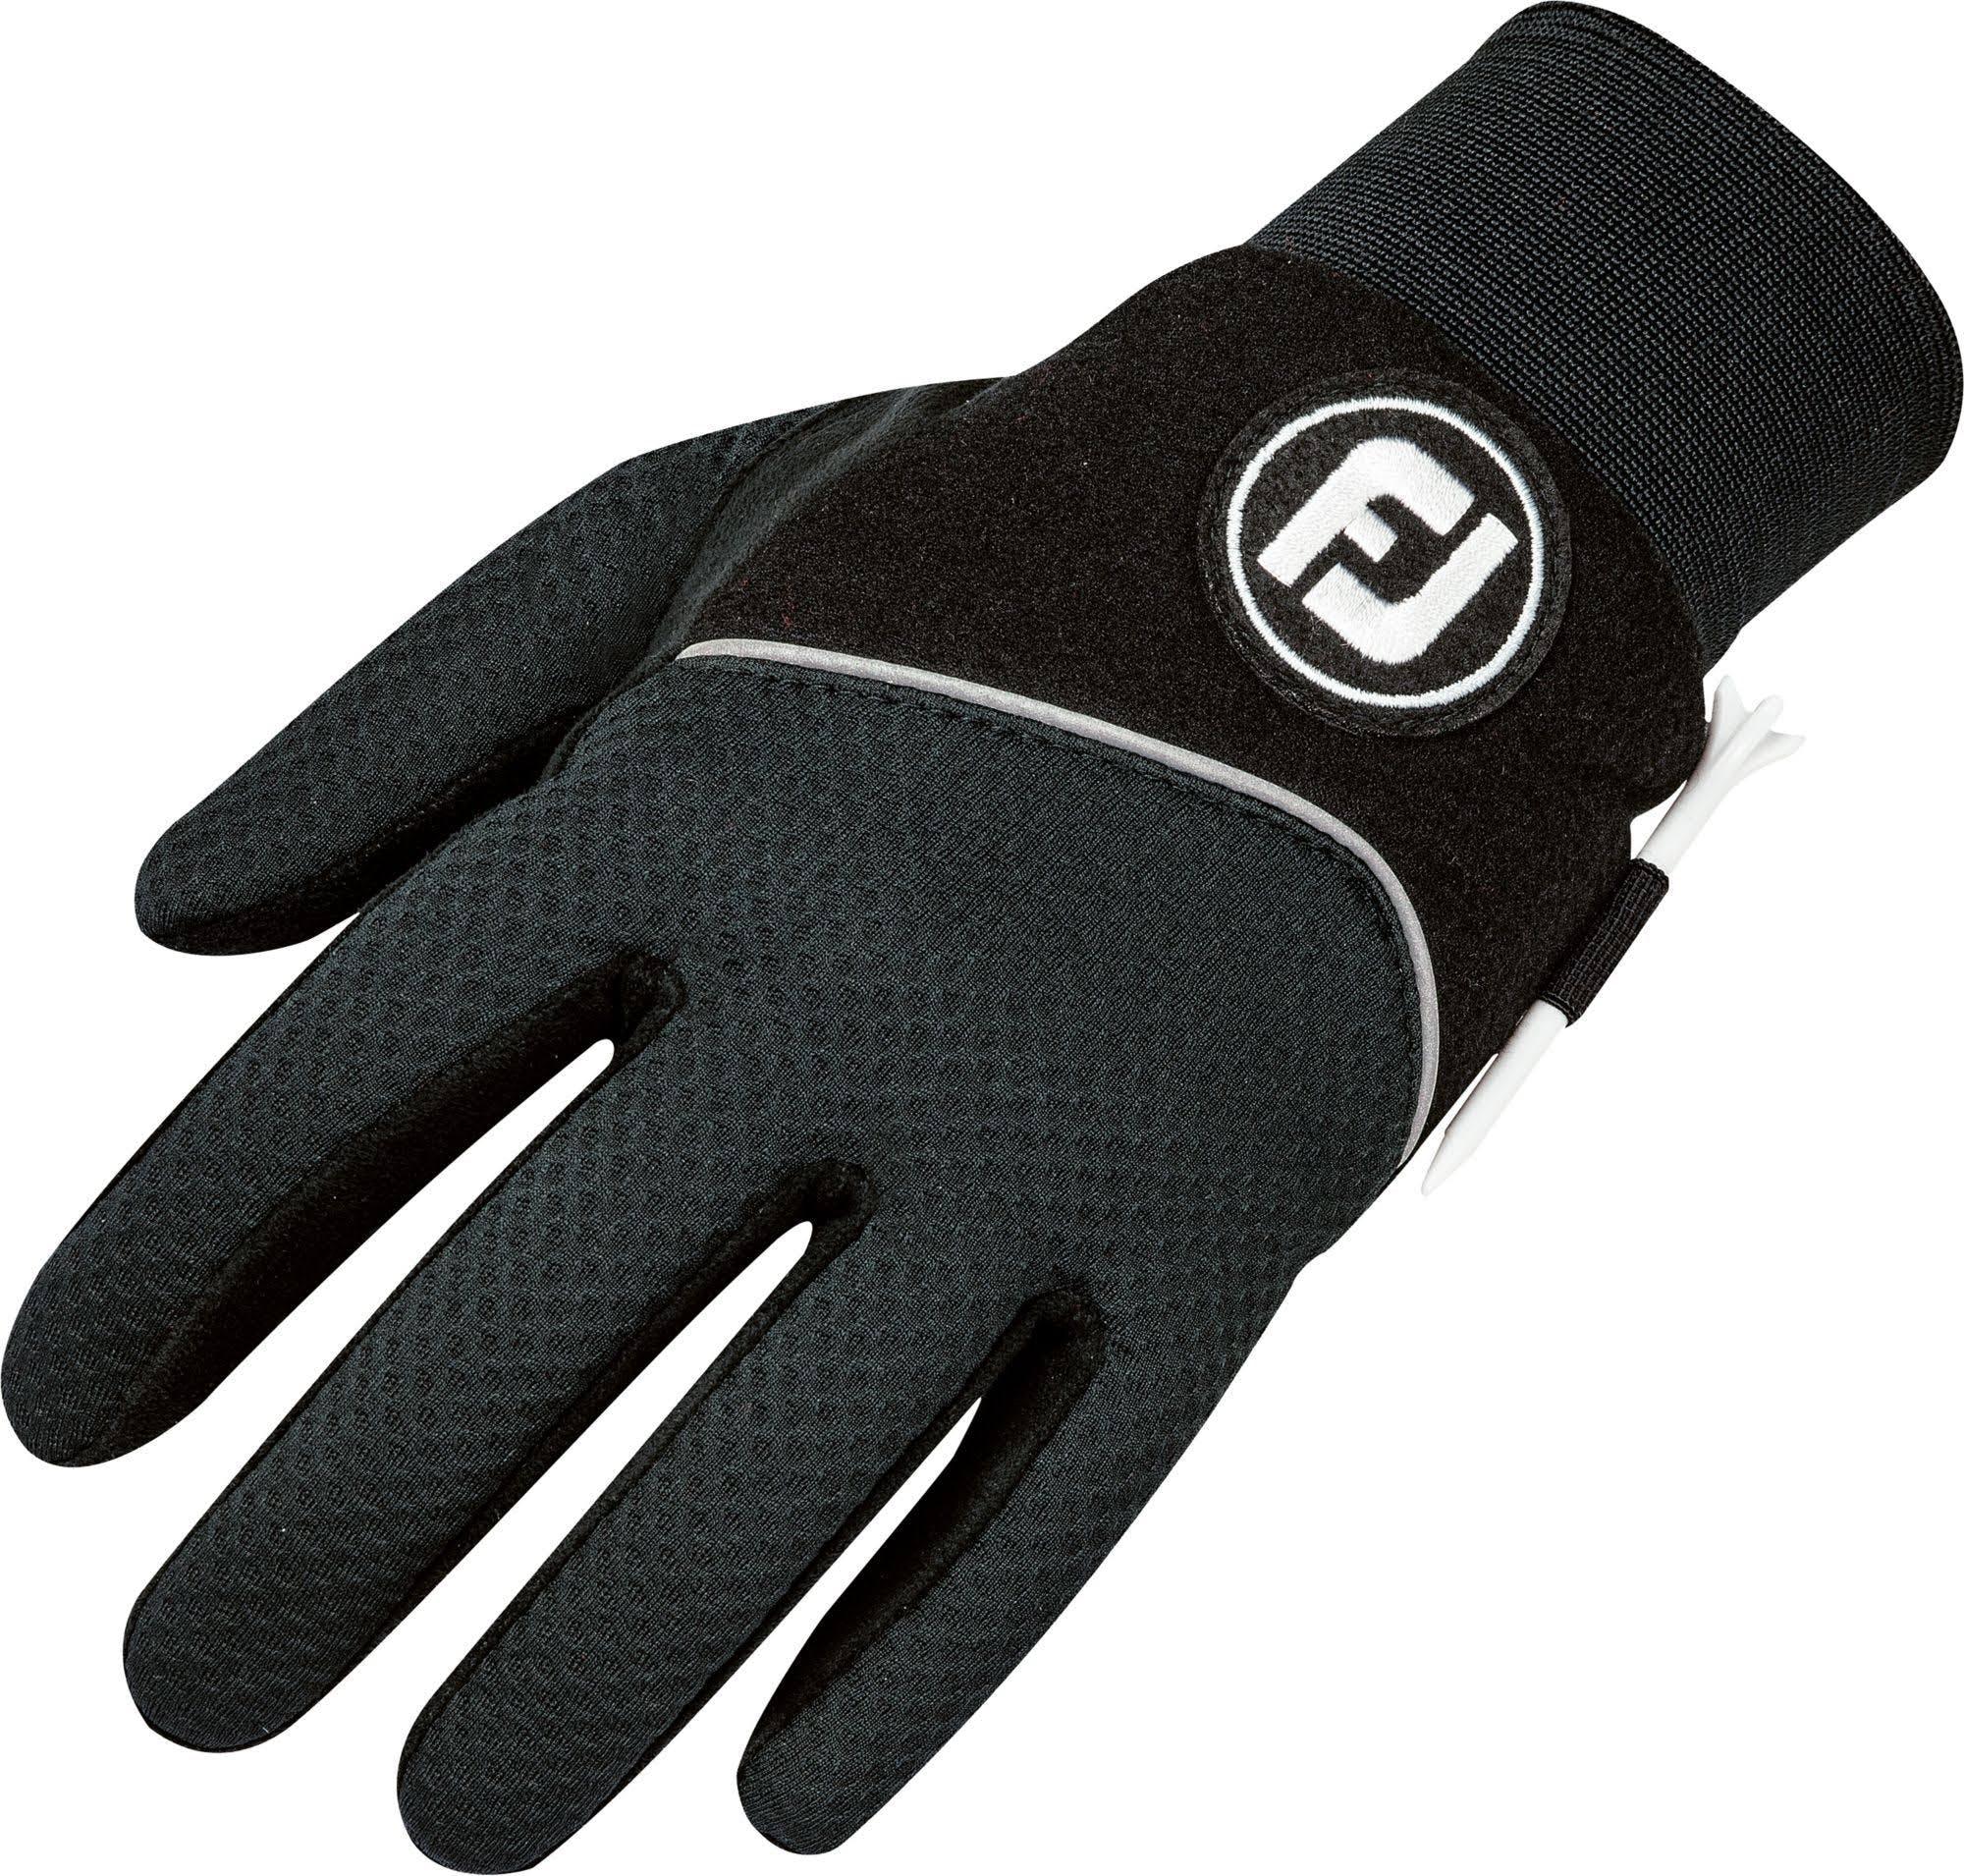 FootJoy Men's WinterSof Golf Gloves, Pair (Black)